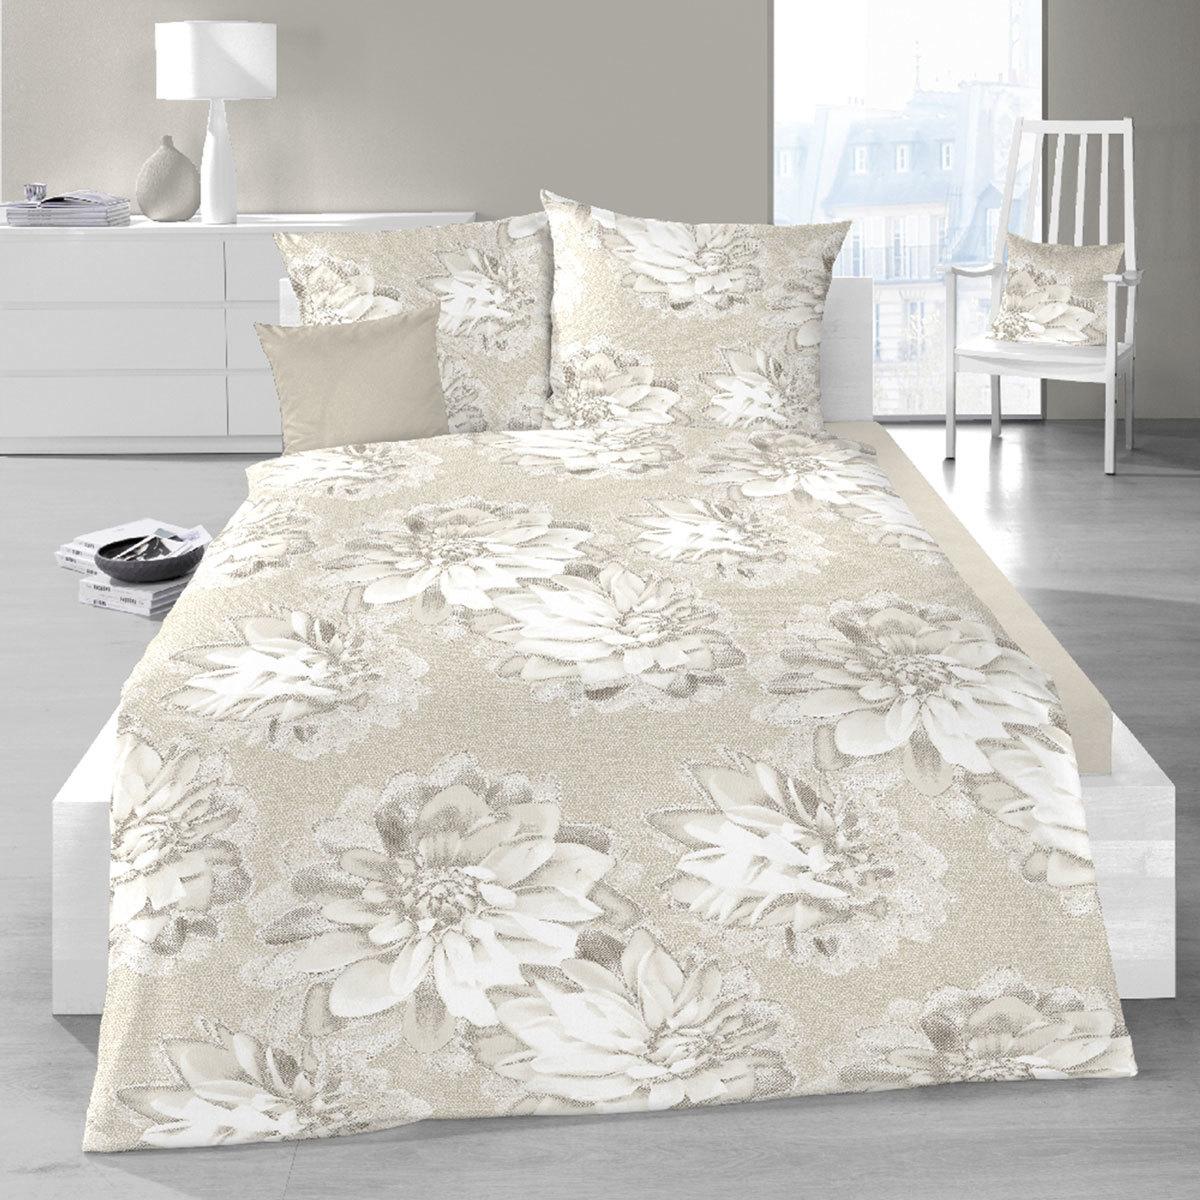 schlafgut mako satin bettw sche sesimbra natural silk fv cks. Black Bedroom Furniture Sets. Home Design Ideas